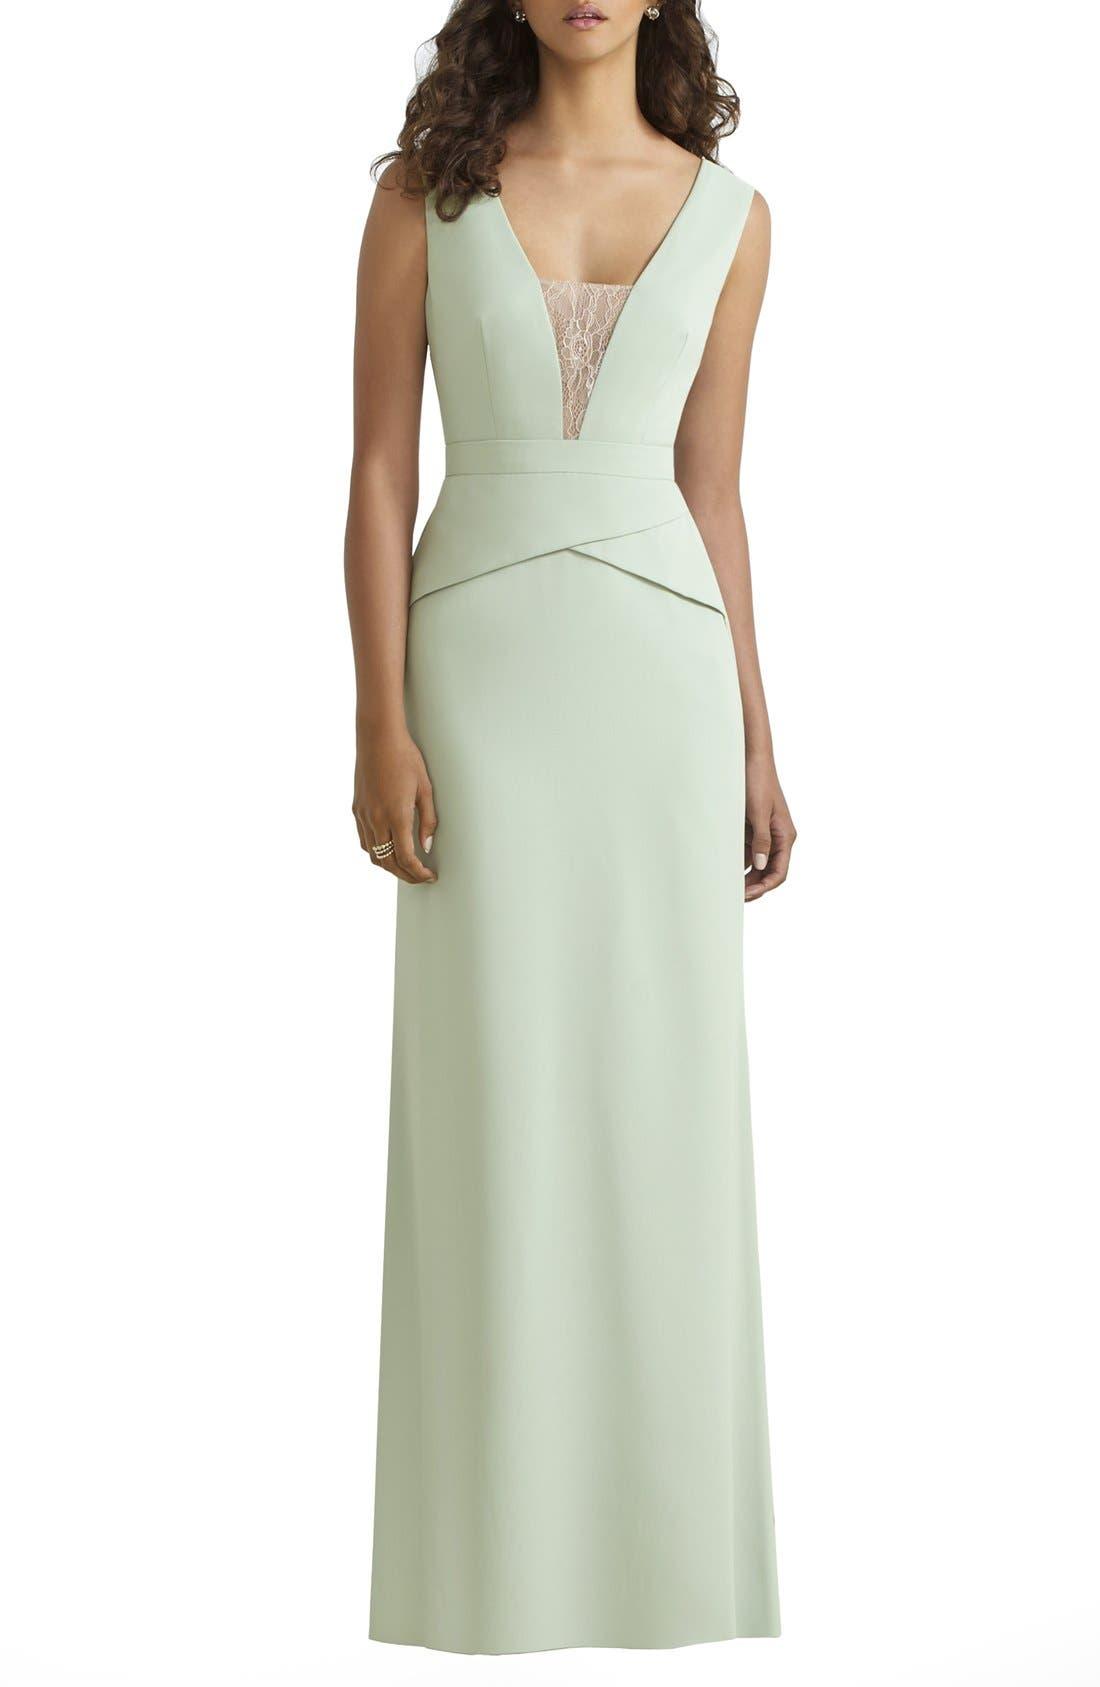 Main Image - Social Bridesmaids Lace Inset V-Neck Peplum Detail Gown